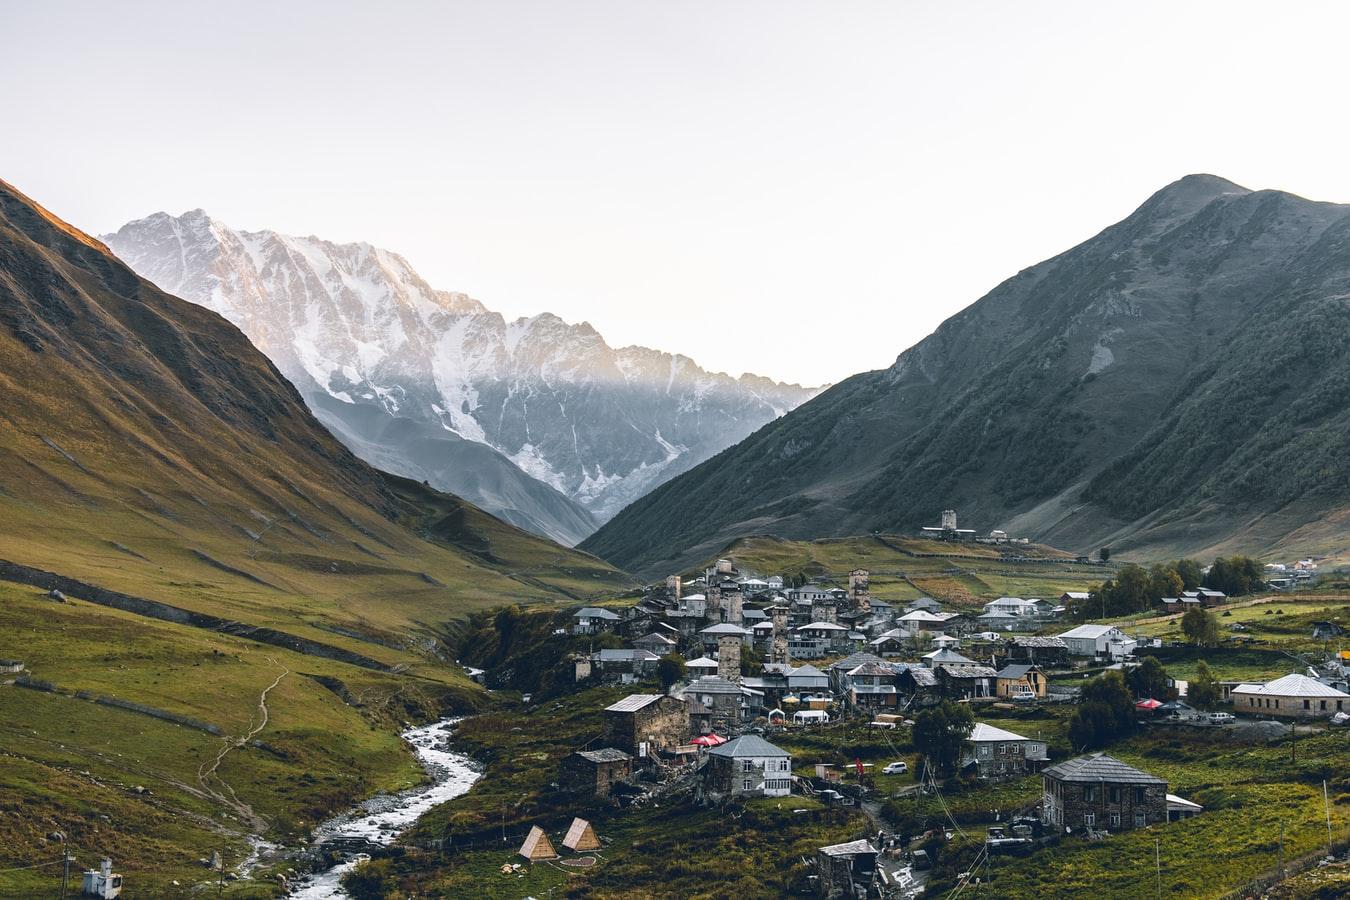 Svaneti - Best Places To Visit in Georgia